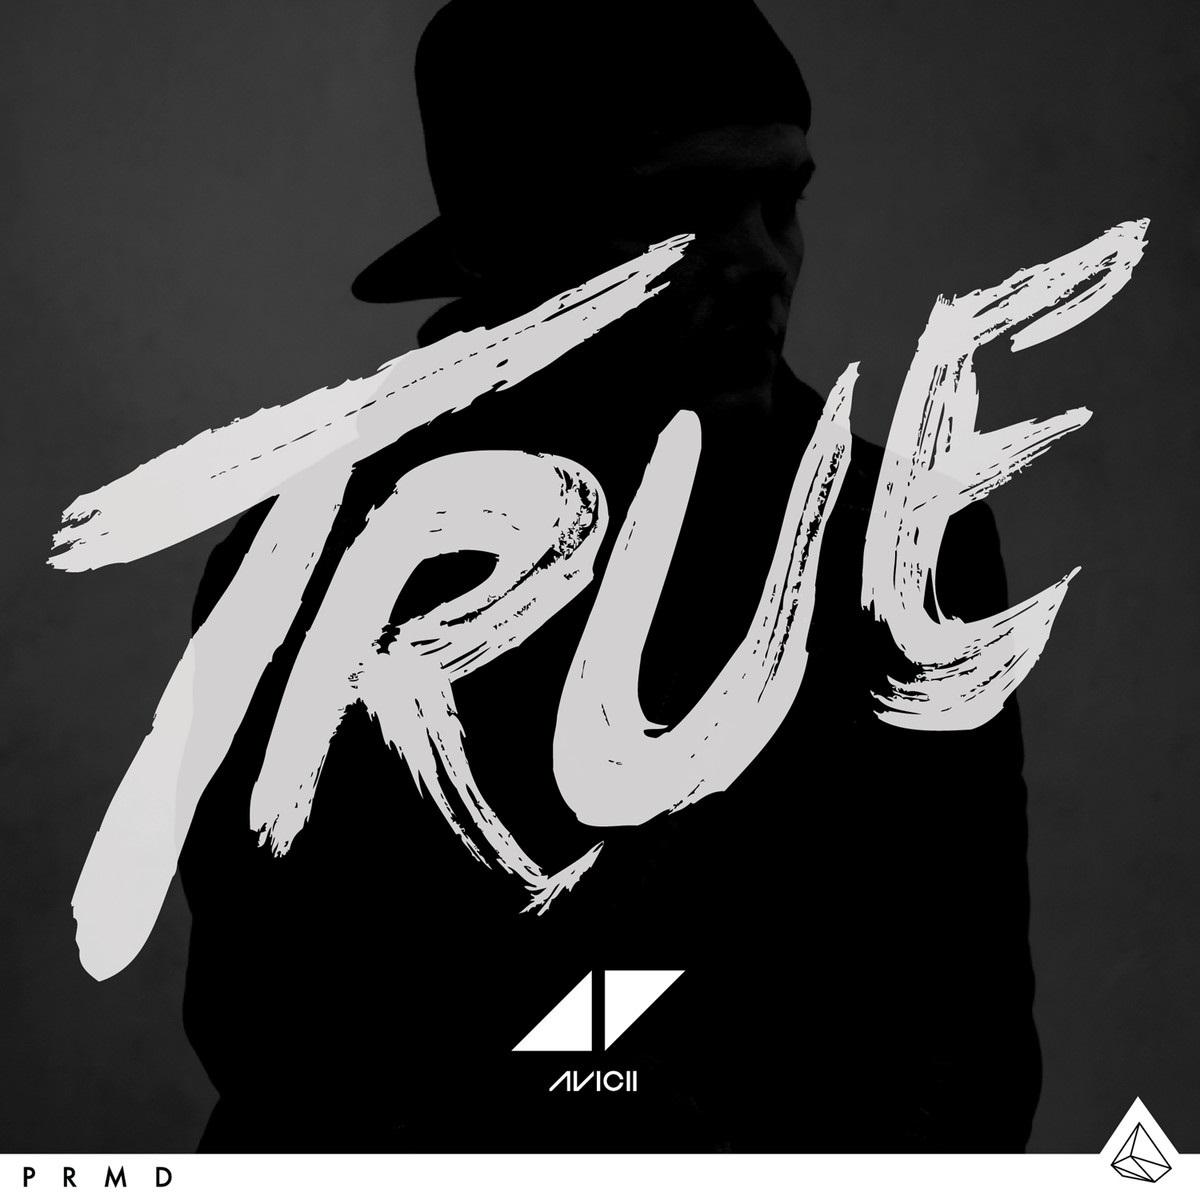 Video: Avicii – Hey Brother